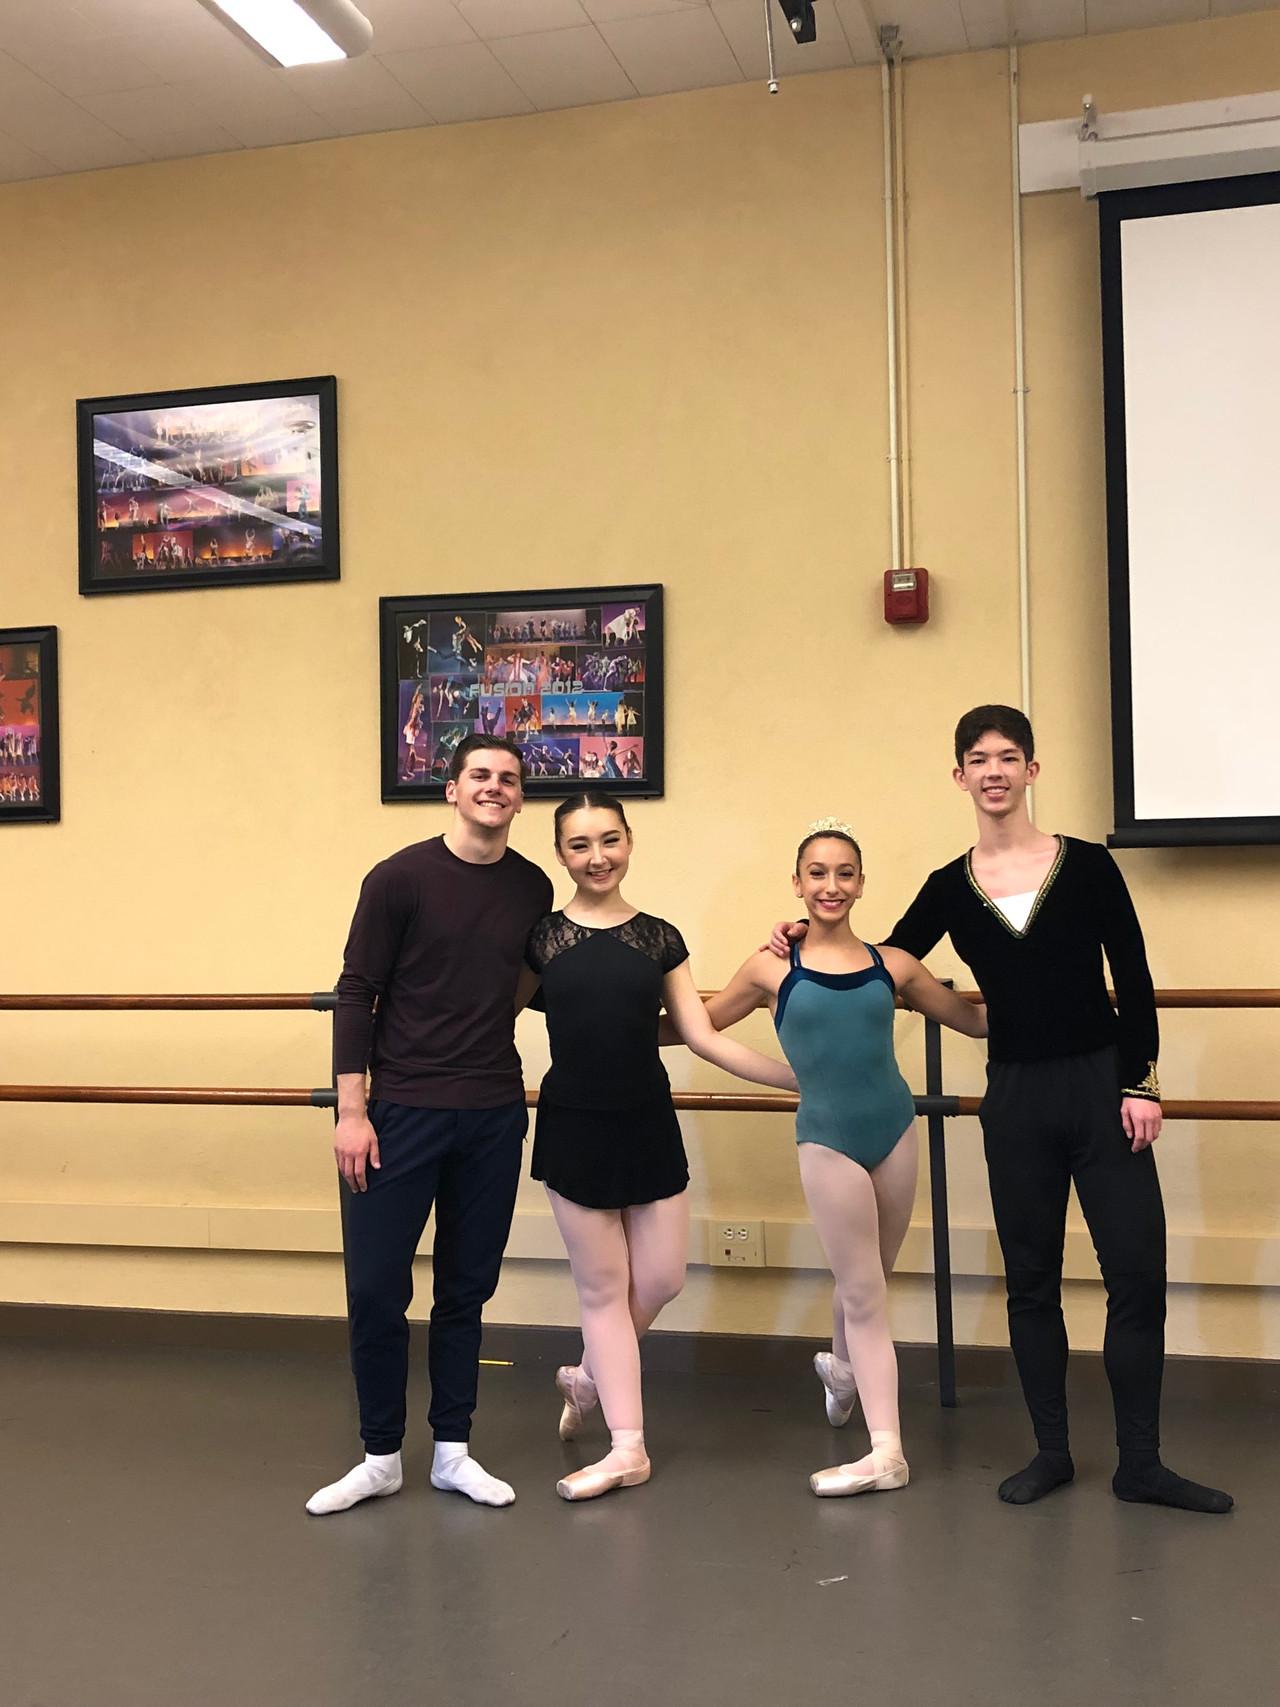 Emma, Brent, LilaRose and Christian warm up for the Pas de Deux/Ensemble competition.